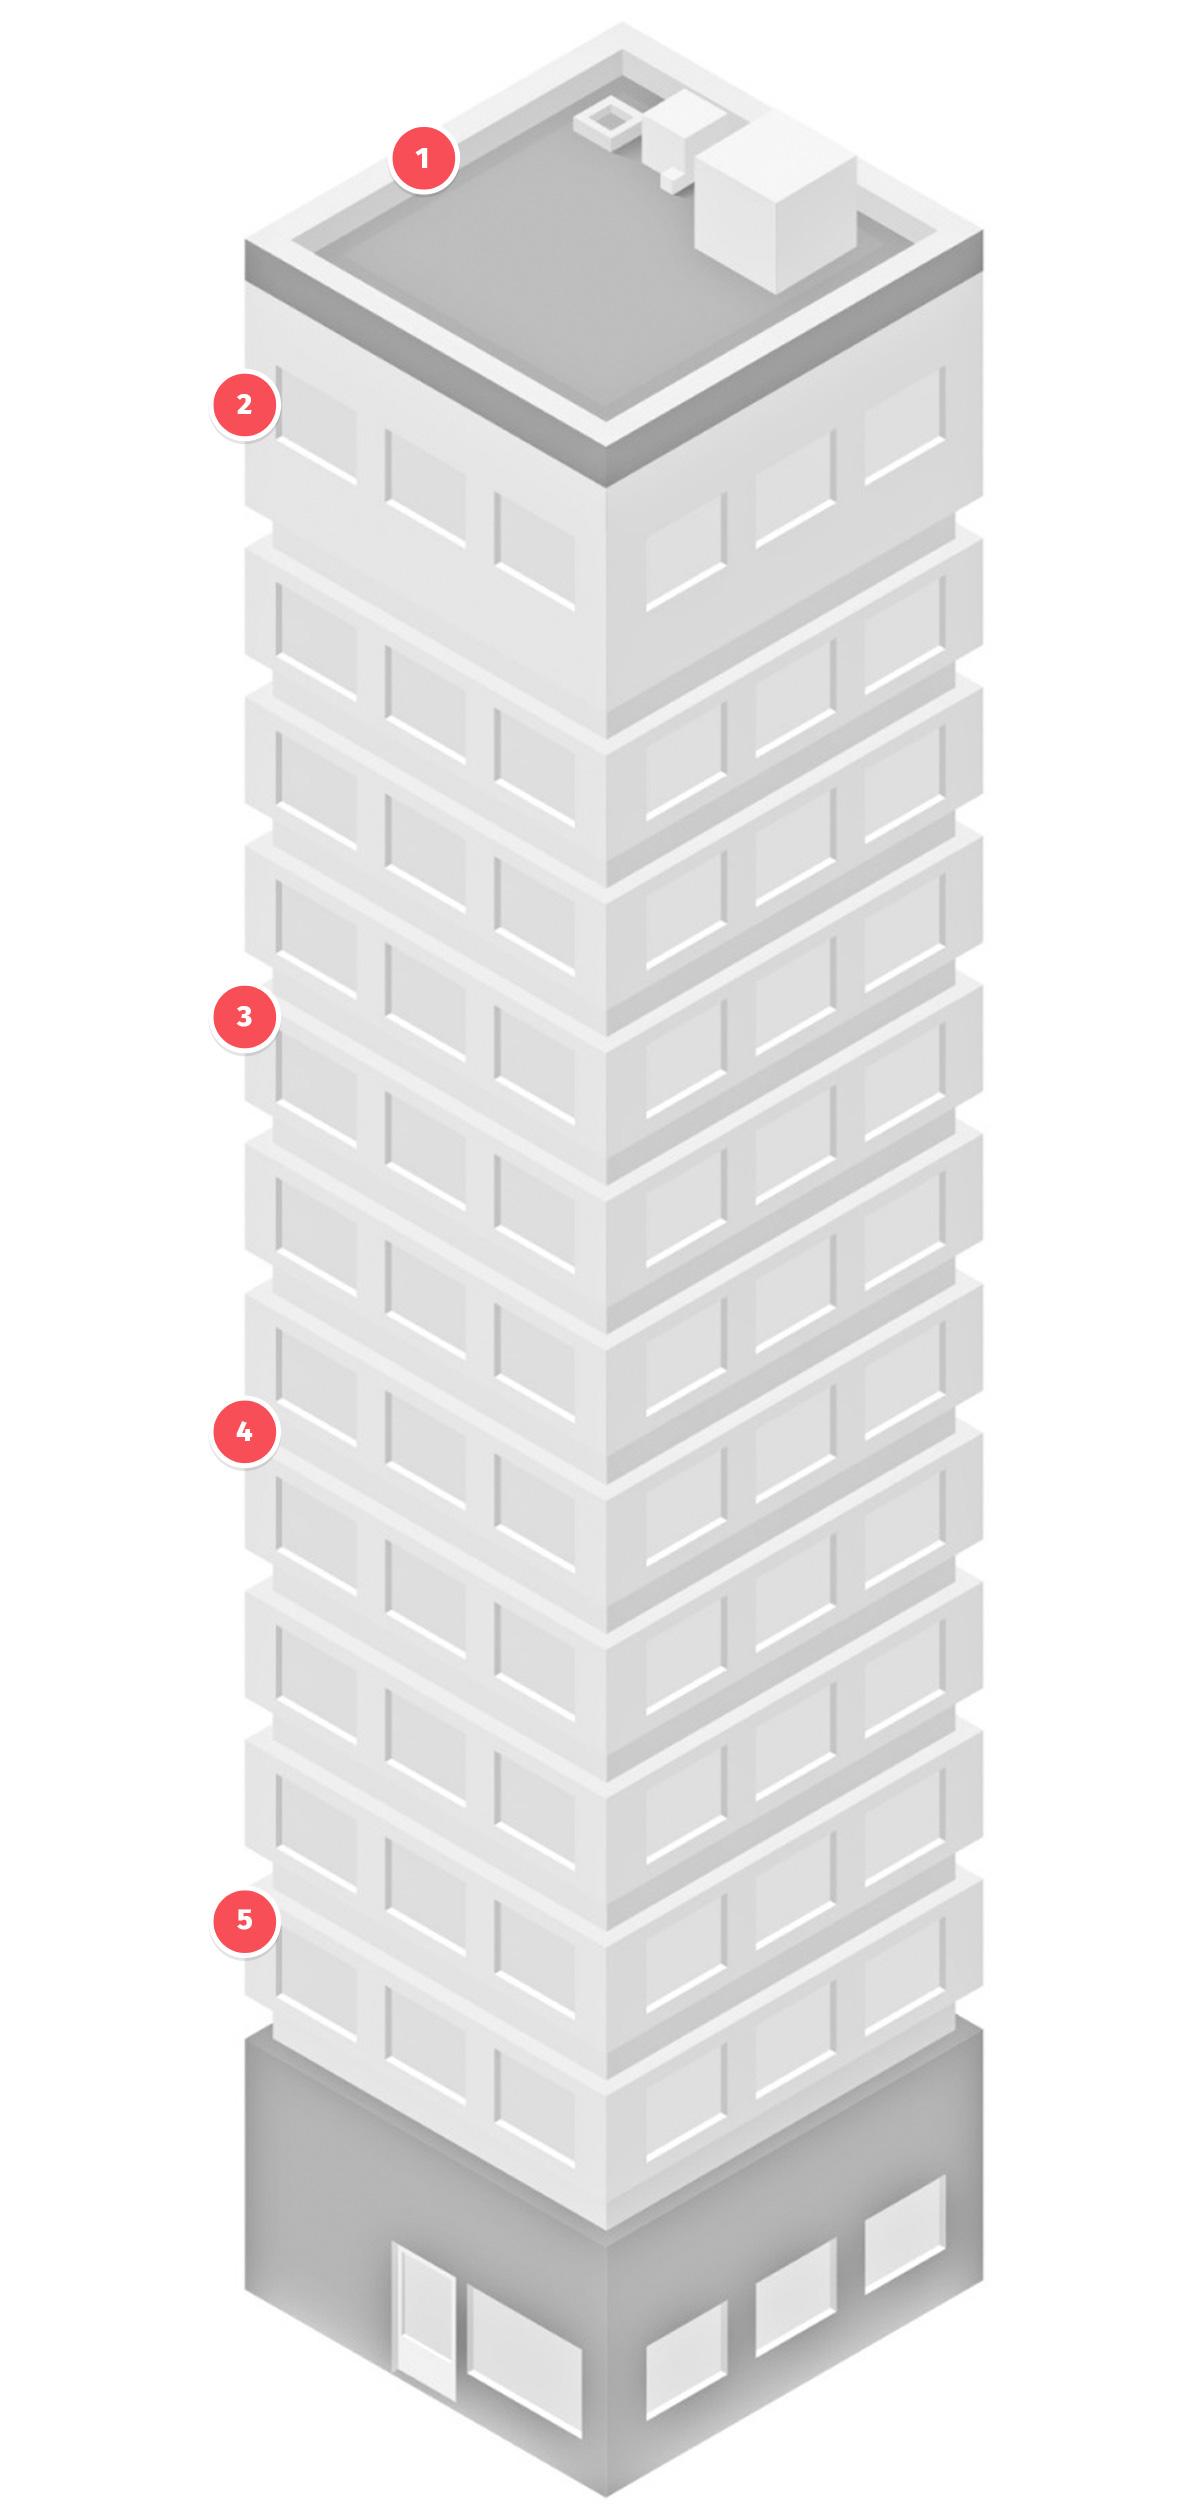 delta-box_applications_balisage-aerien-de-batiments-schema-visuel